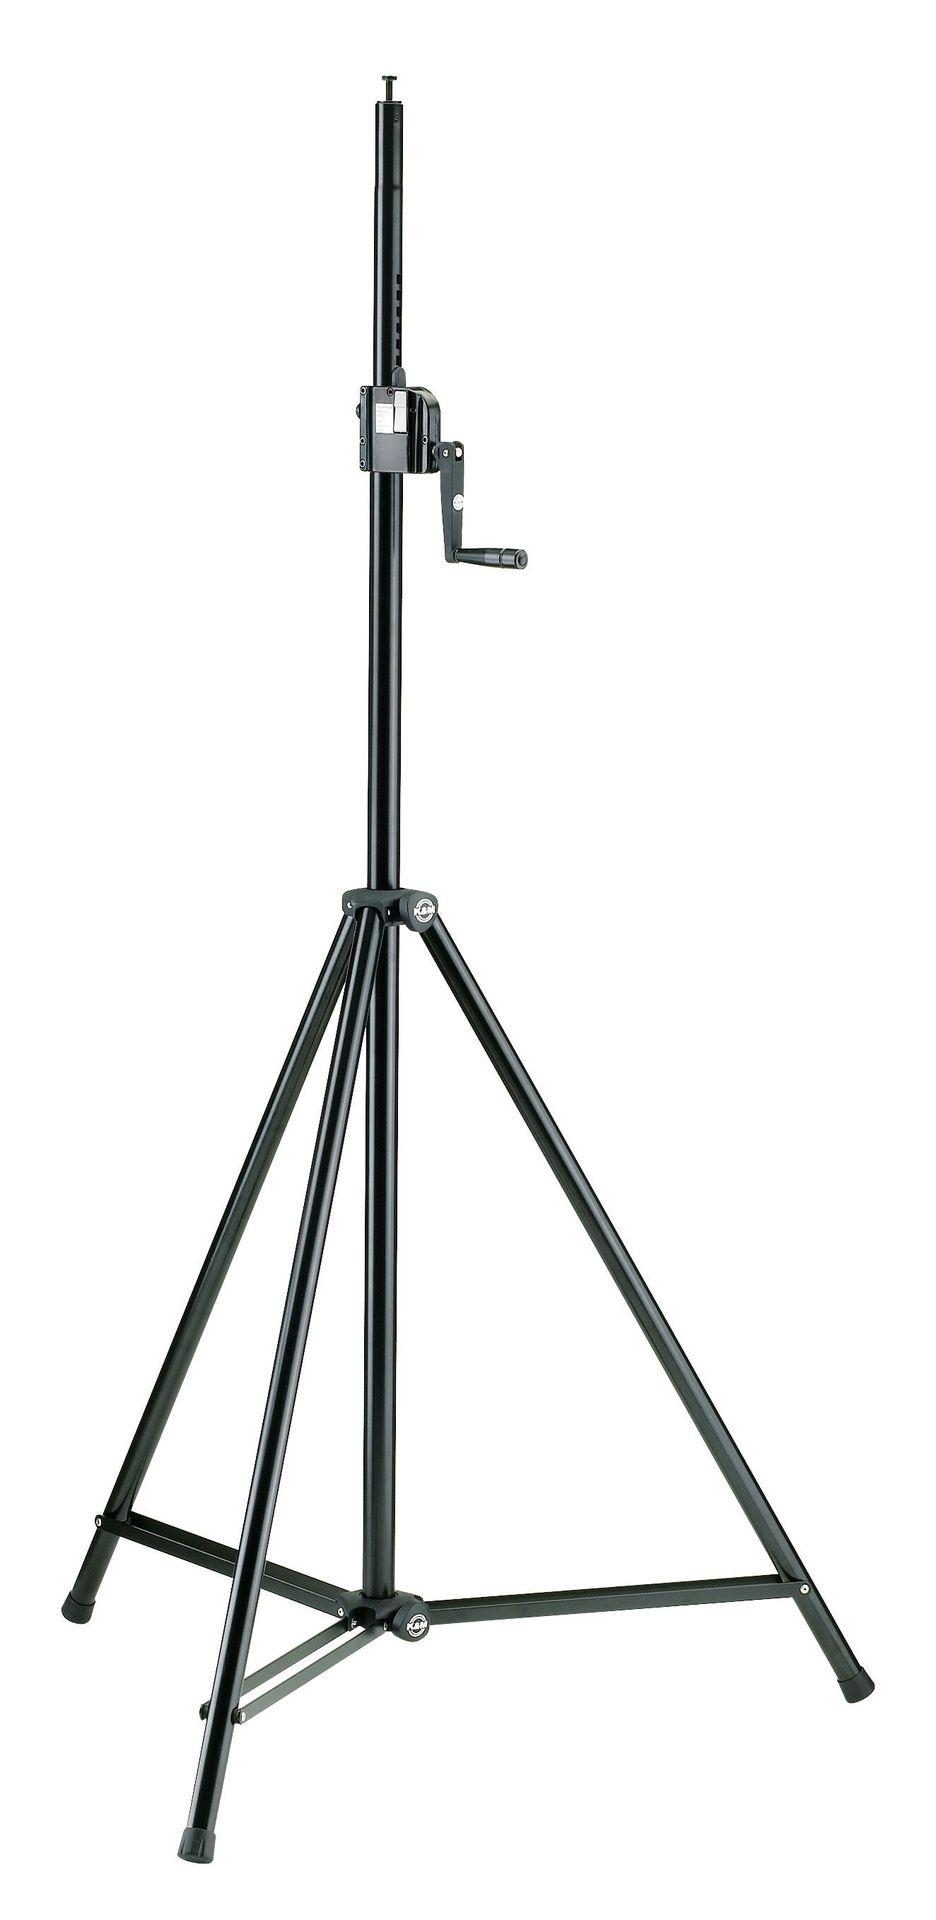 K&M 246/1 Kurbel-Lichtstativ